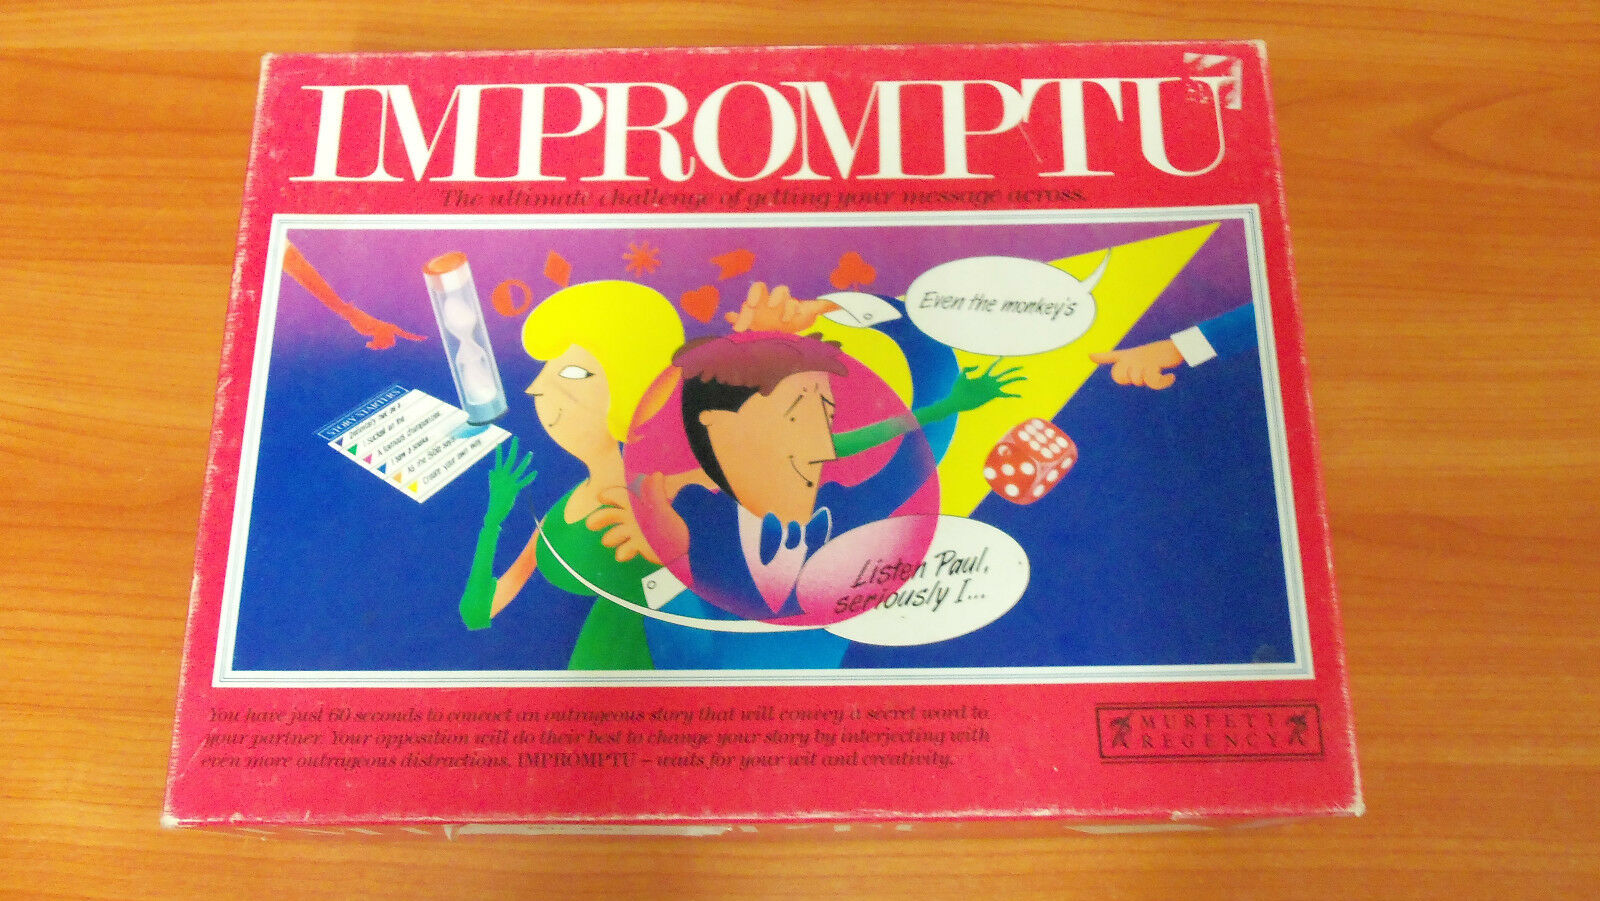 1991 Game Board Game 1991 - Impromptu - 100% Complete a694ea